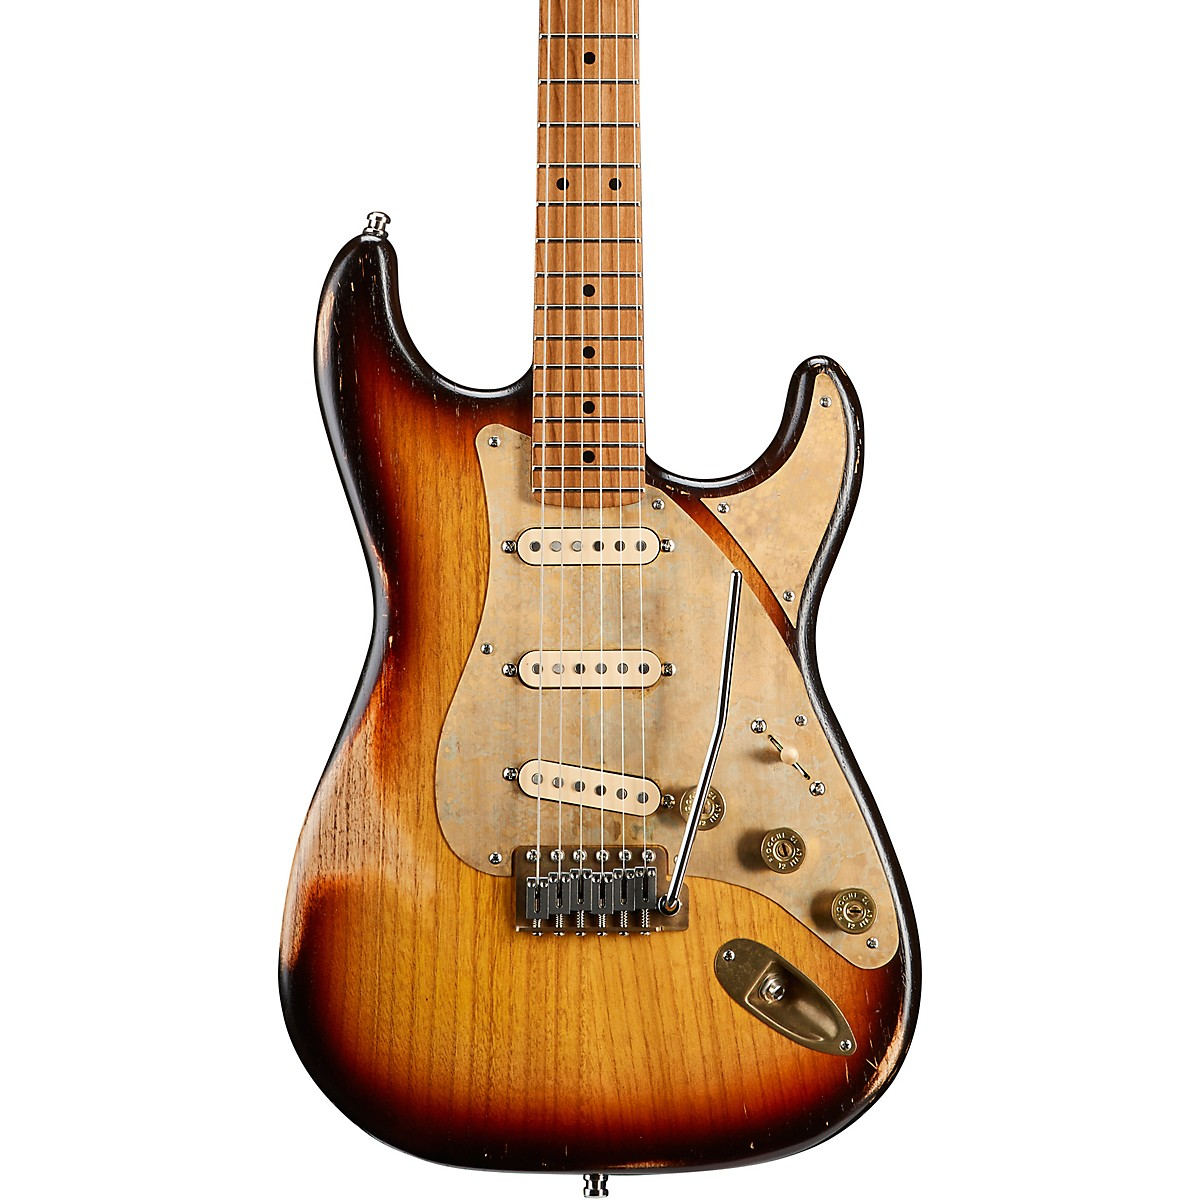 Paoletti Guitars Stratospheric Loft SSS Electric Guitar